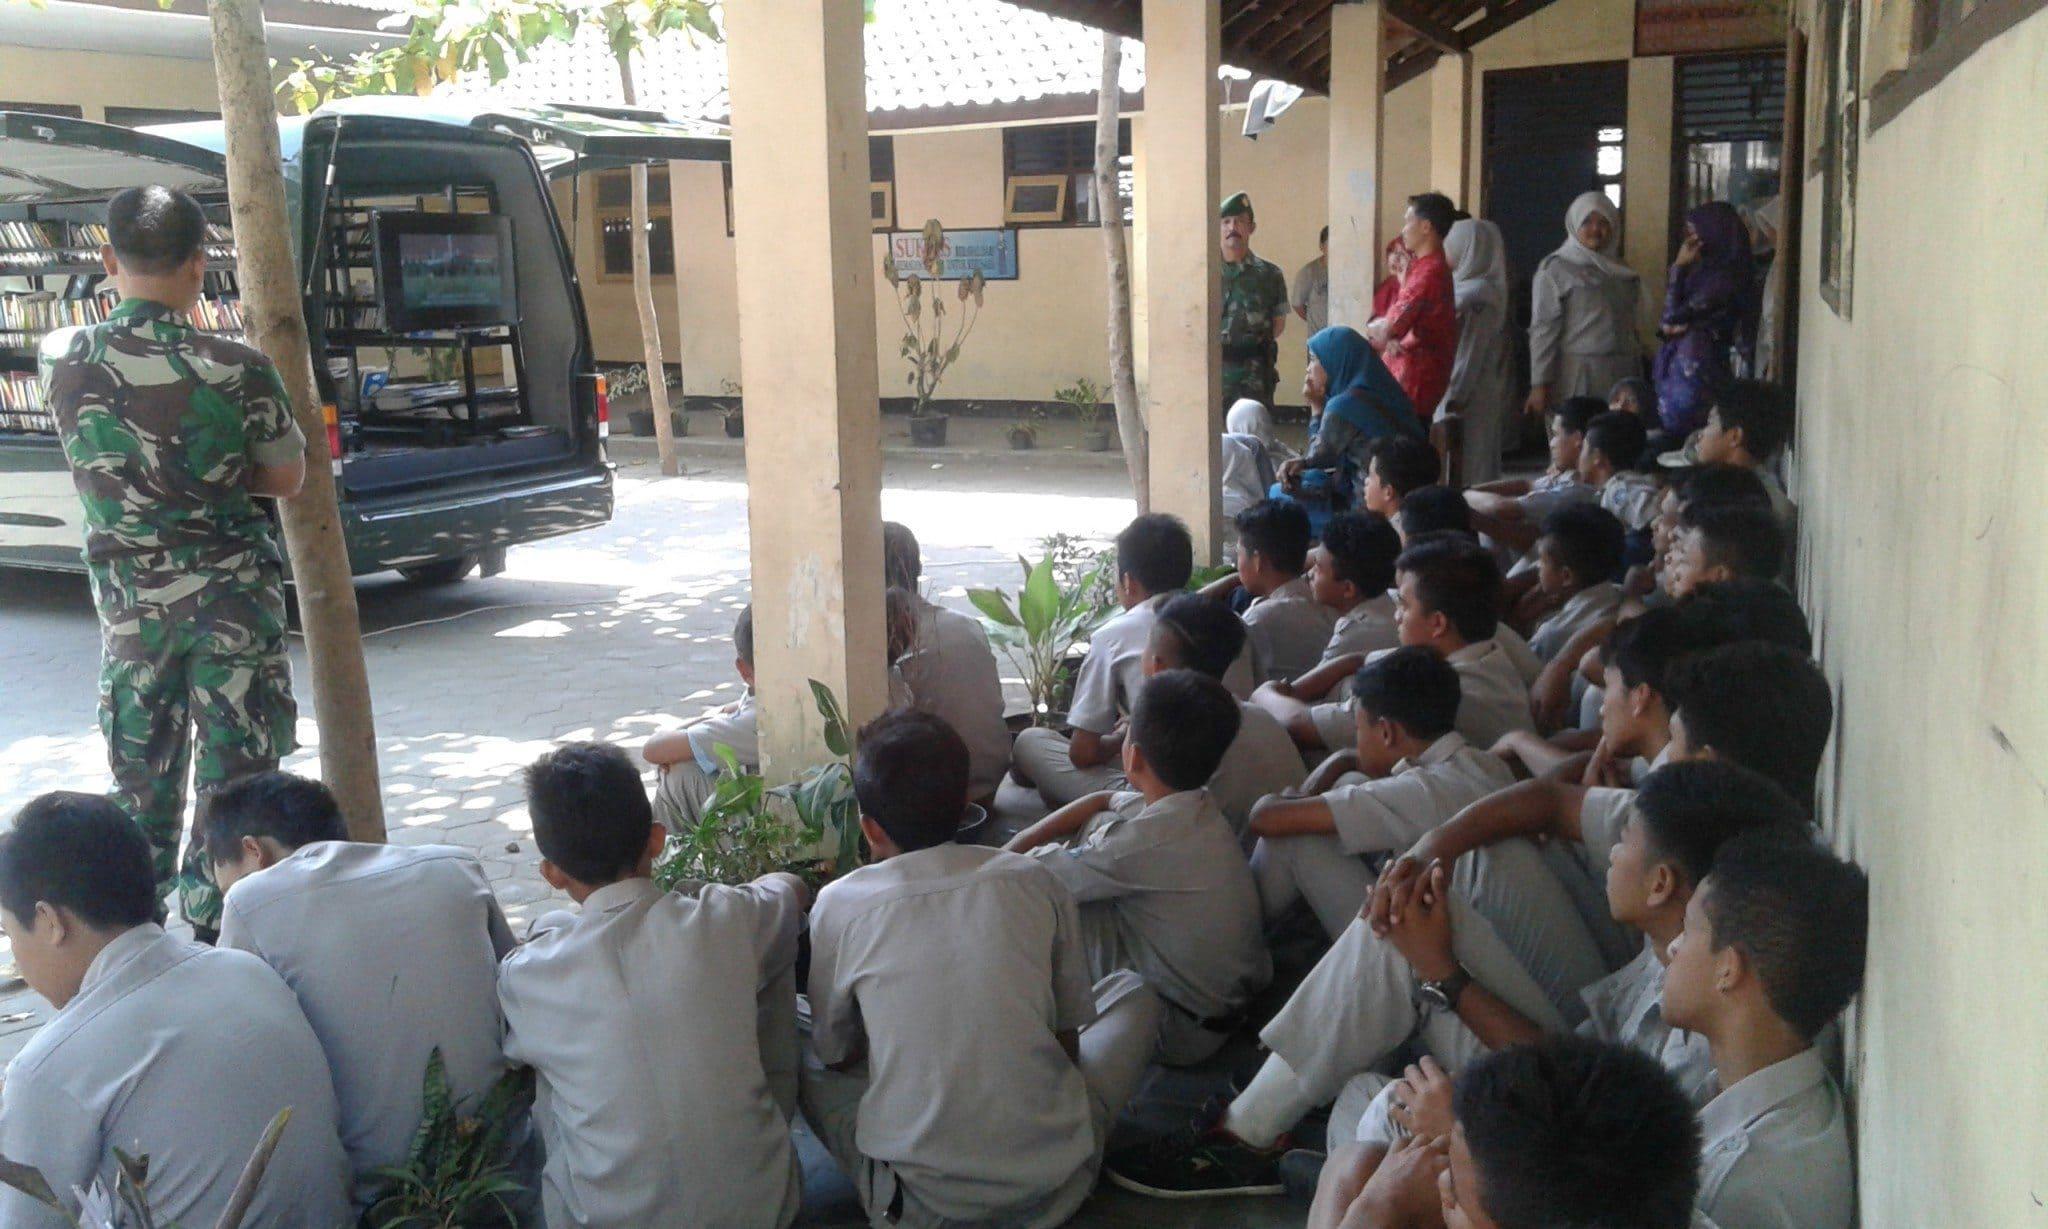 Mobil Penerangan & Perpustakaan Keliling Kodim 0705/Magelang Sambangi SMP Purnama Tempuran